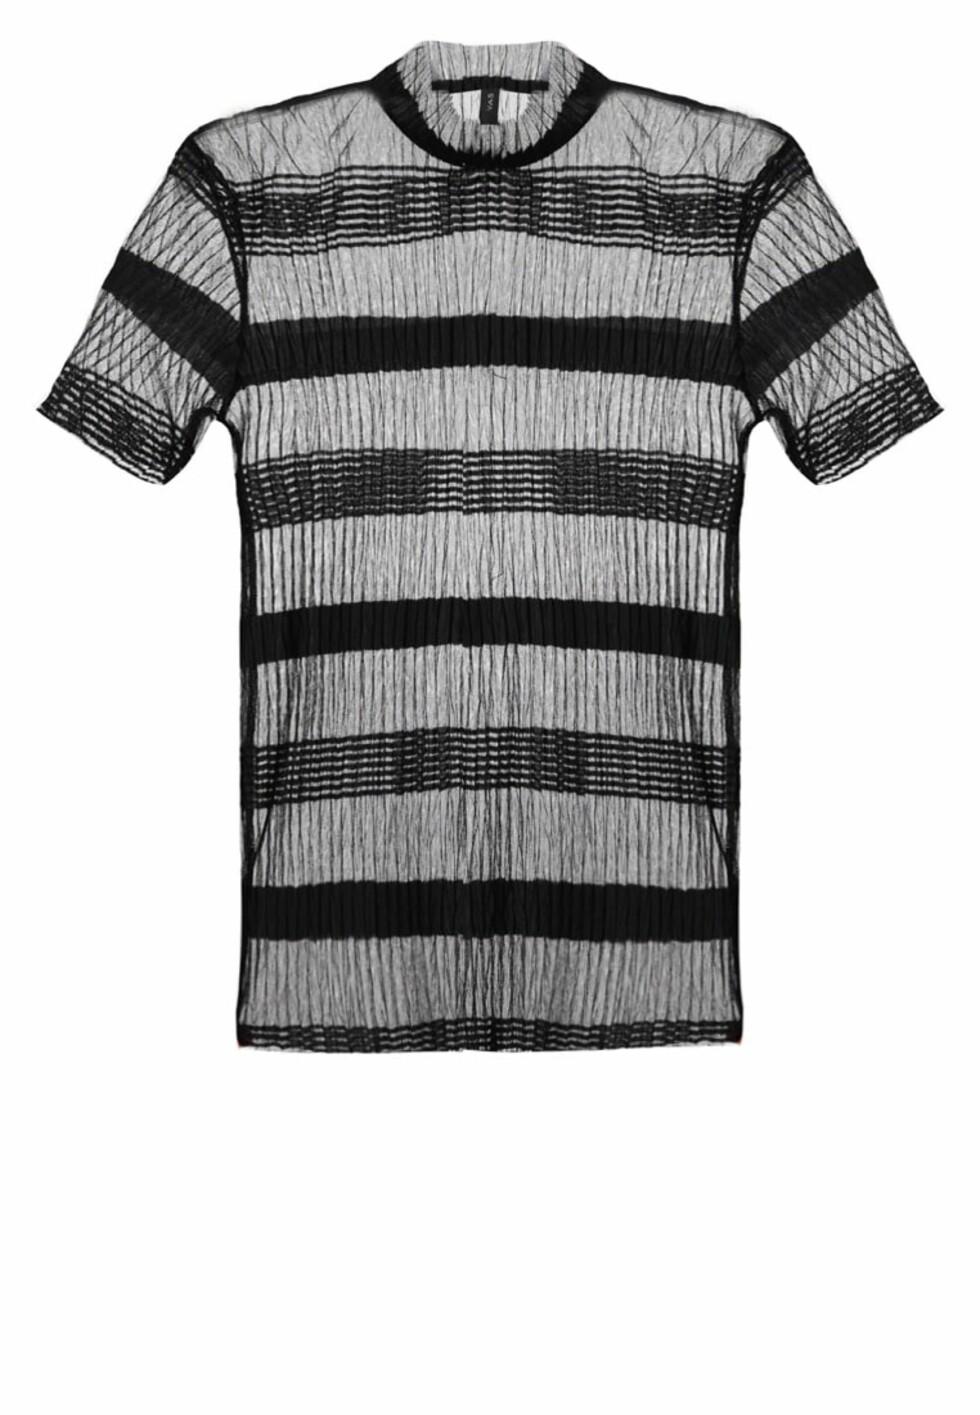 Topp fra YAS via Zalando.no | kr 159 | http://marketing.net.zalando.no/ts/i4062628/tsc?amc=aff.znd.47259.54735.57747&rmd=3&trg=https%3A%2F%2Fwww.zalando.no%2Fyas-yasbertille-t-shirts-med-print-black-y0121d011-q11.html%3Fwmc%3DAFF47_IG_NO.%23%7BPARTNER_ID%7D_%23%7BADSPACE_ID%7D..